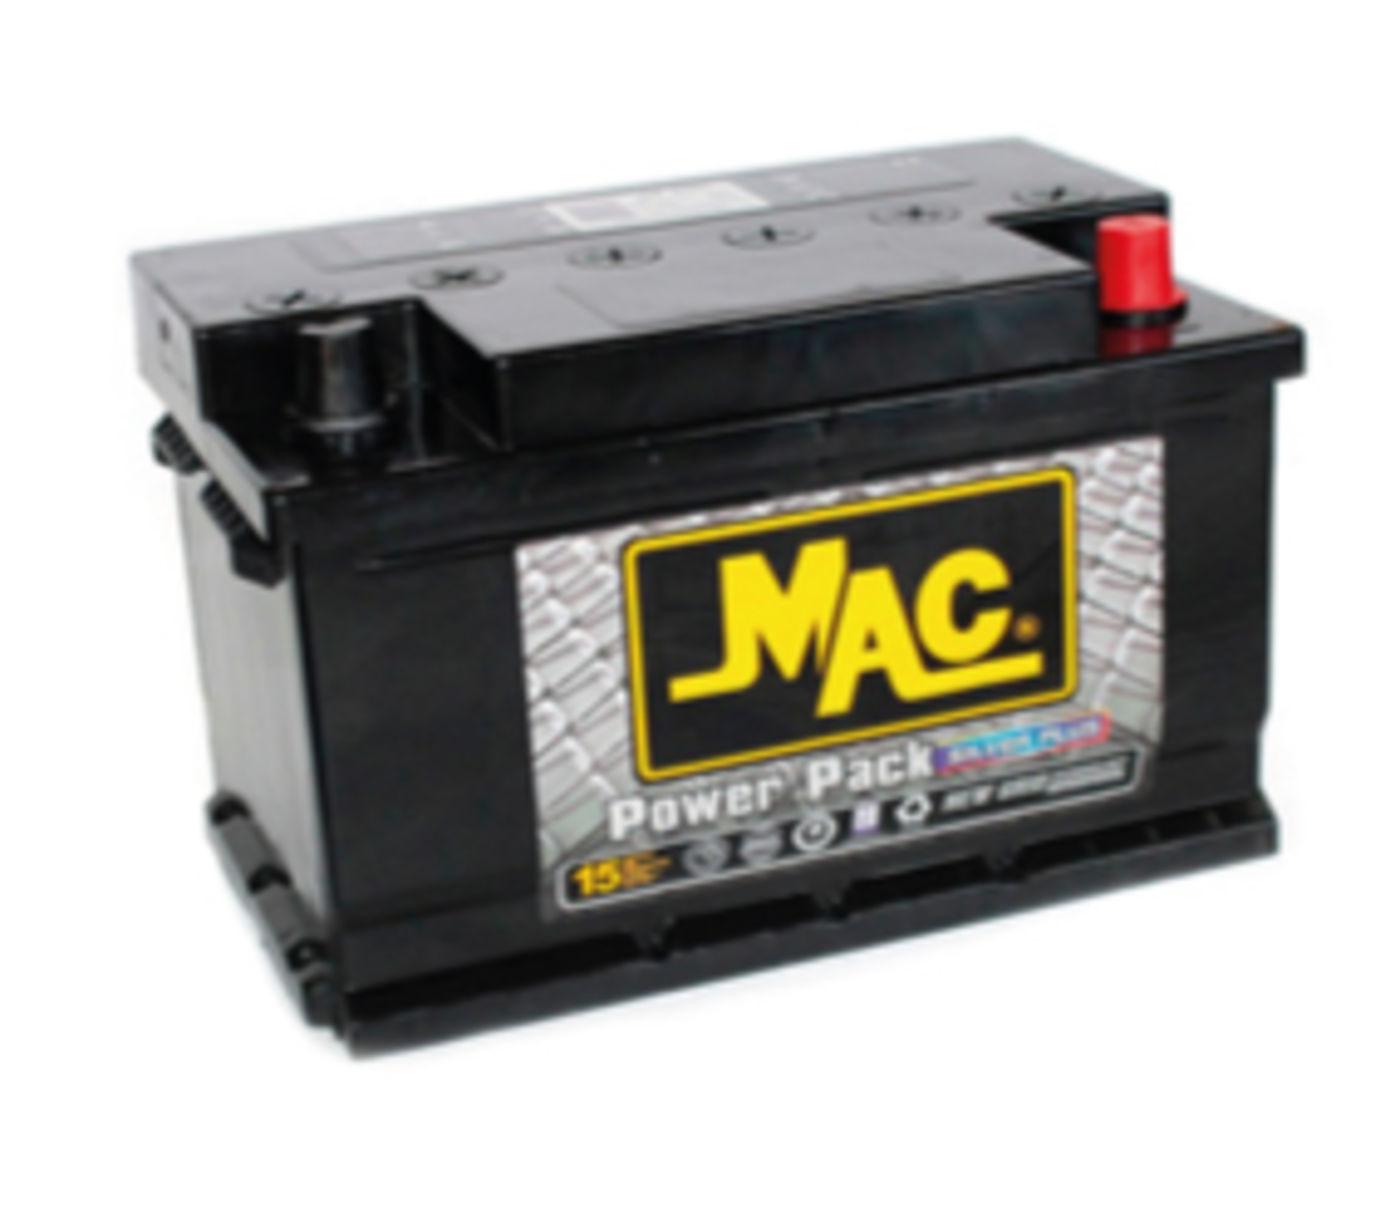 Mac 31 T 1100M